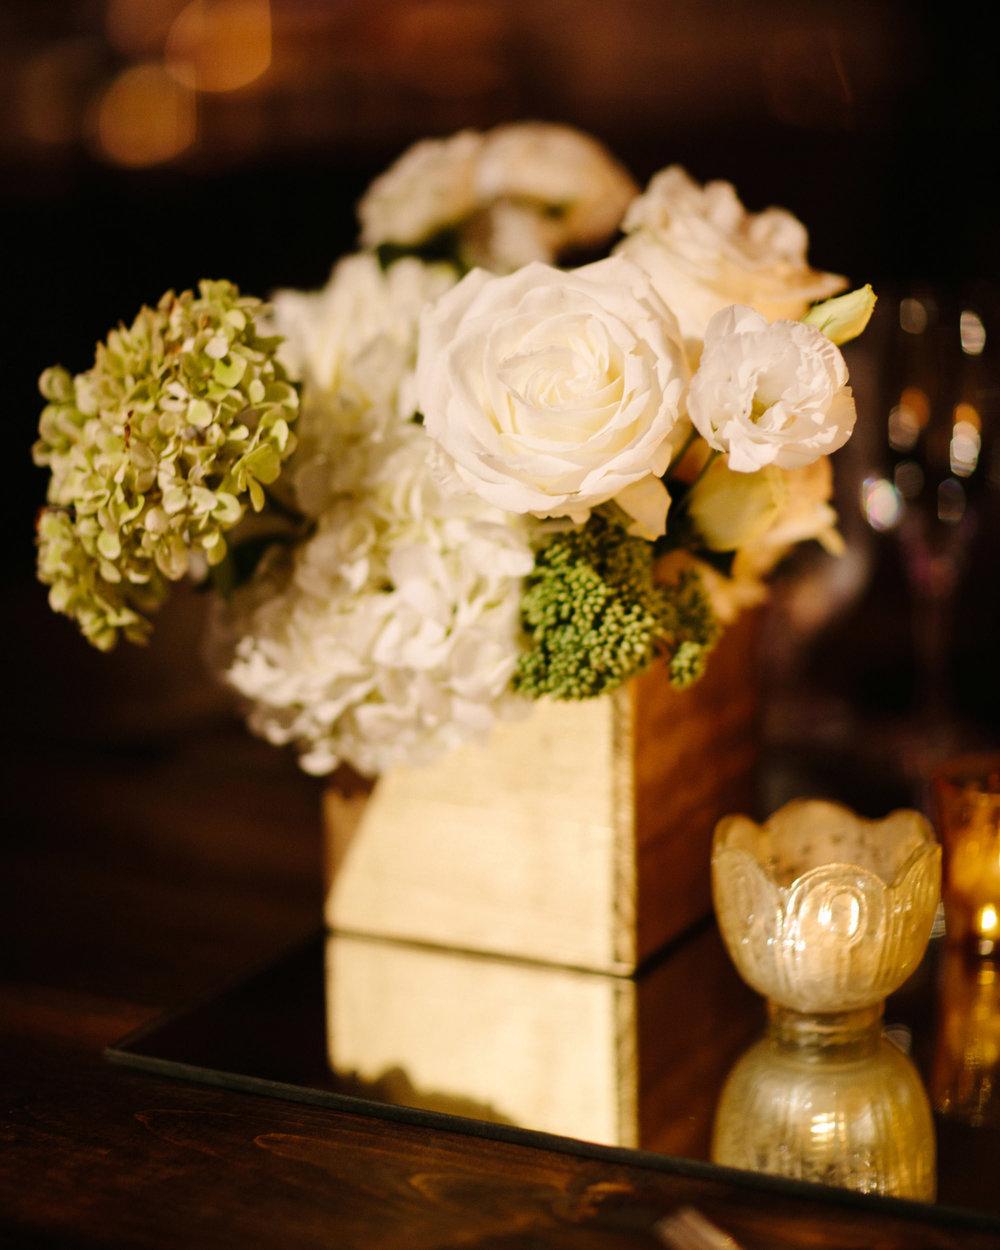 ojai_valley_inn_wedding_photos_51.jpg